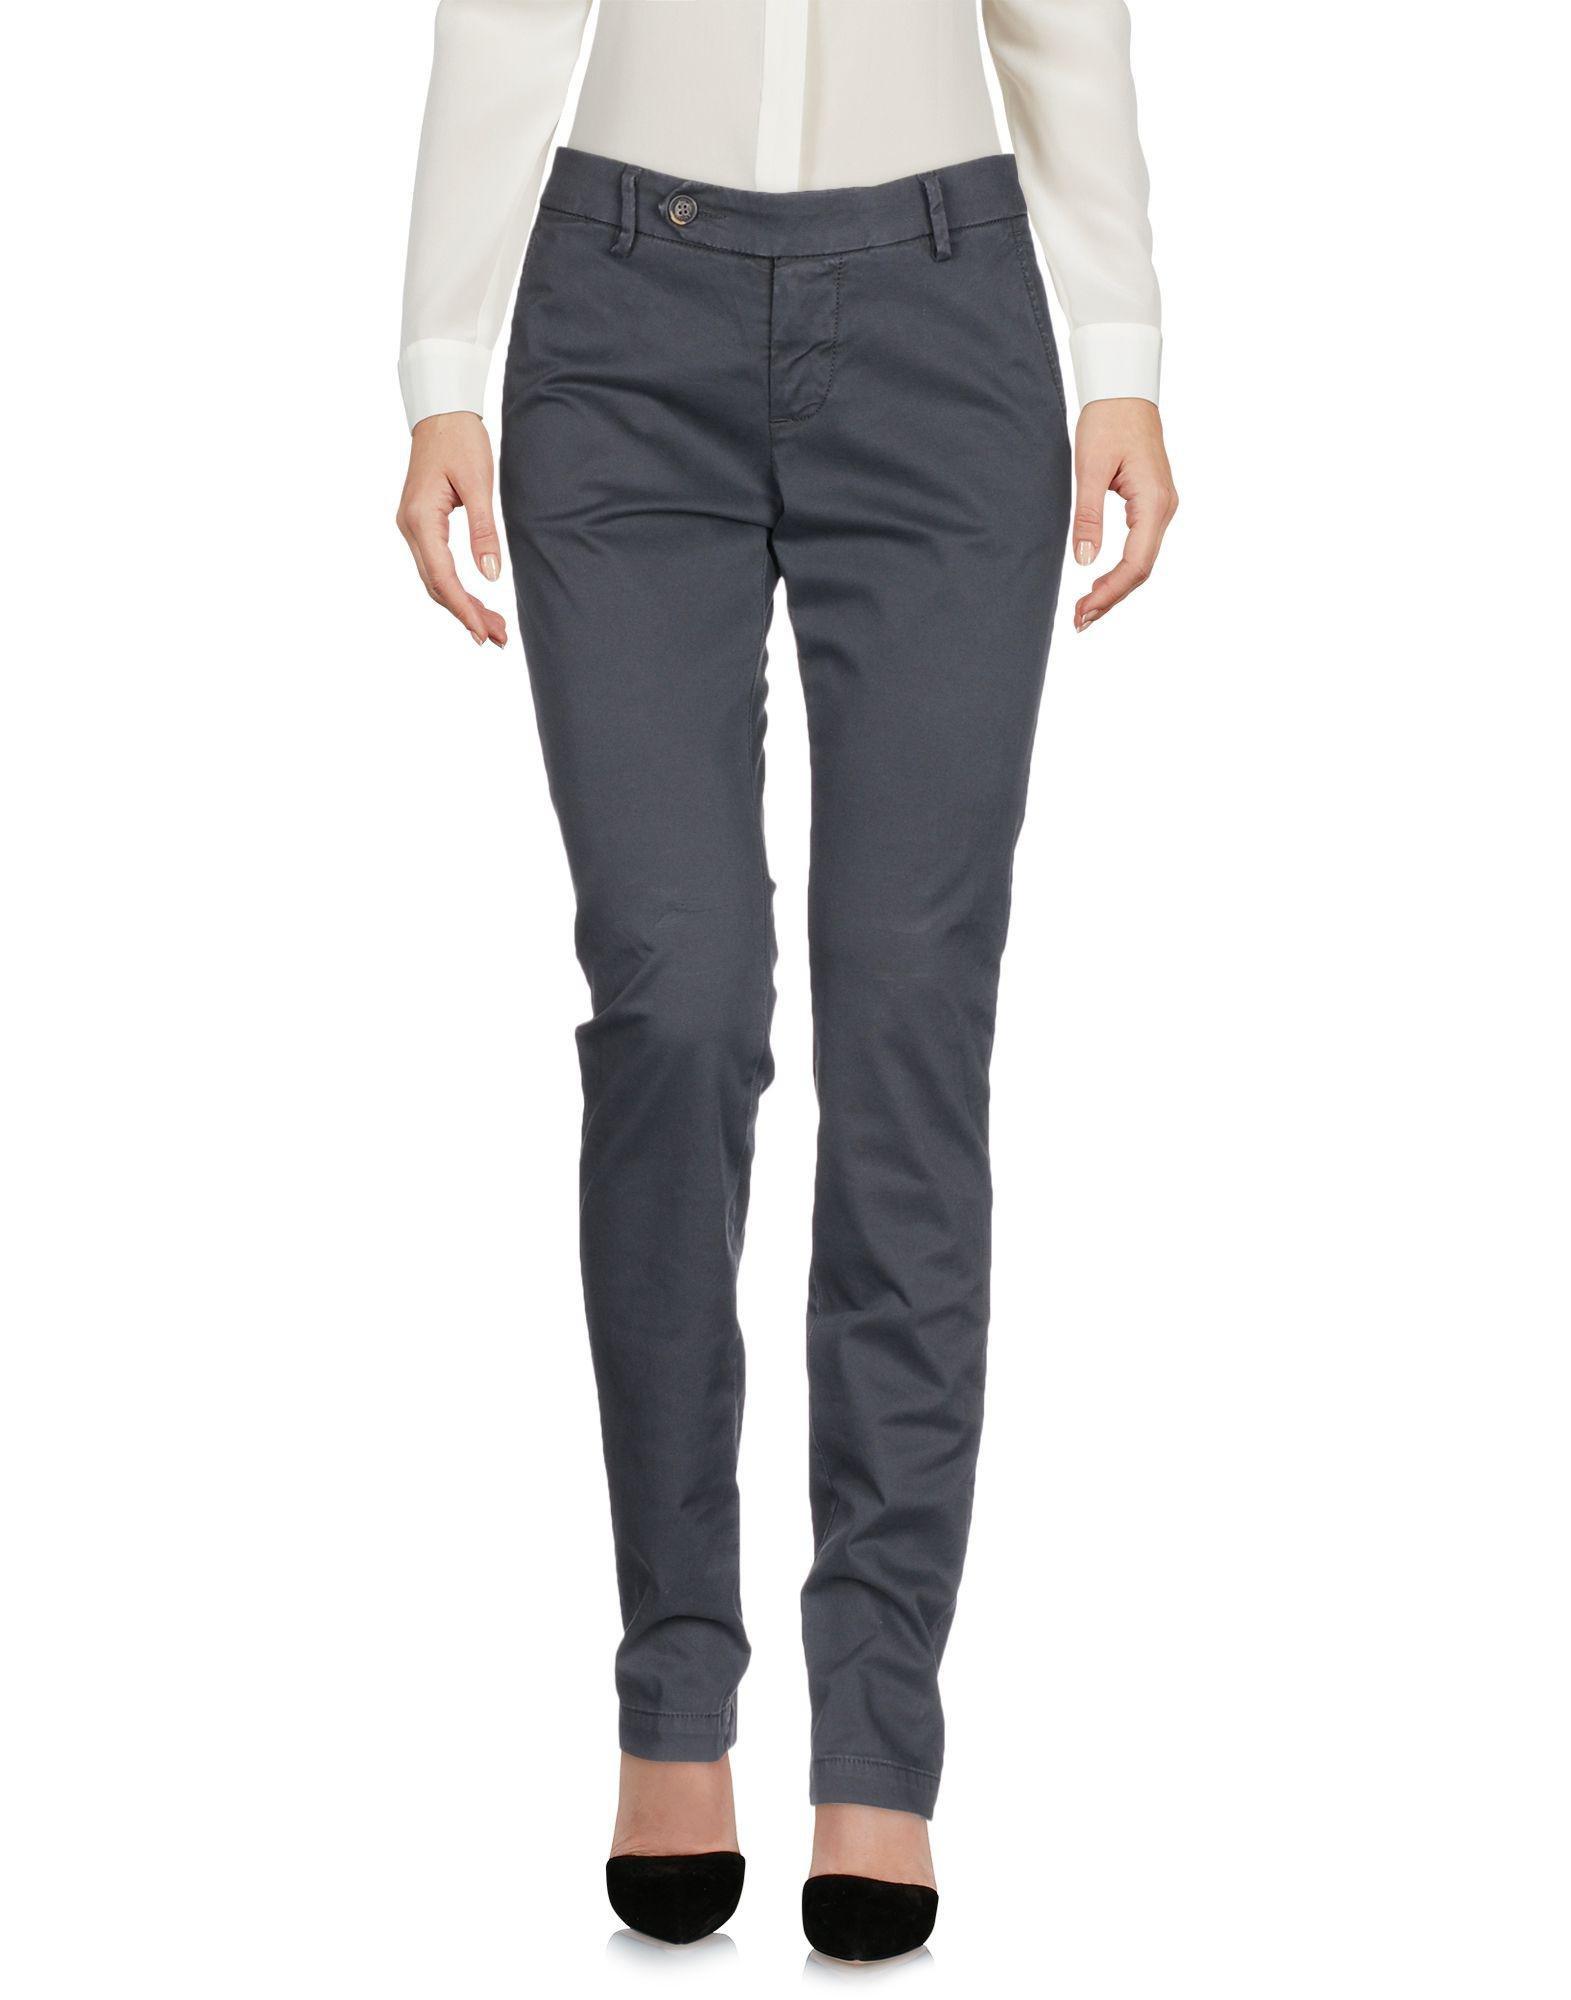 Pantalon - Short Roy Rogers agKvM3